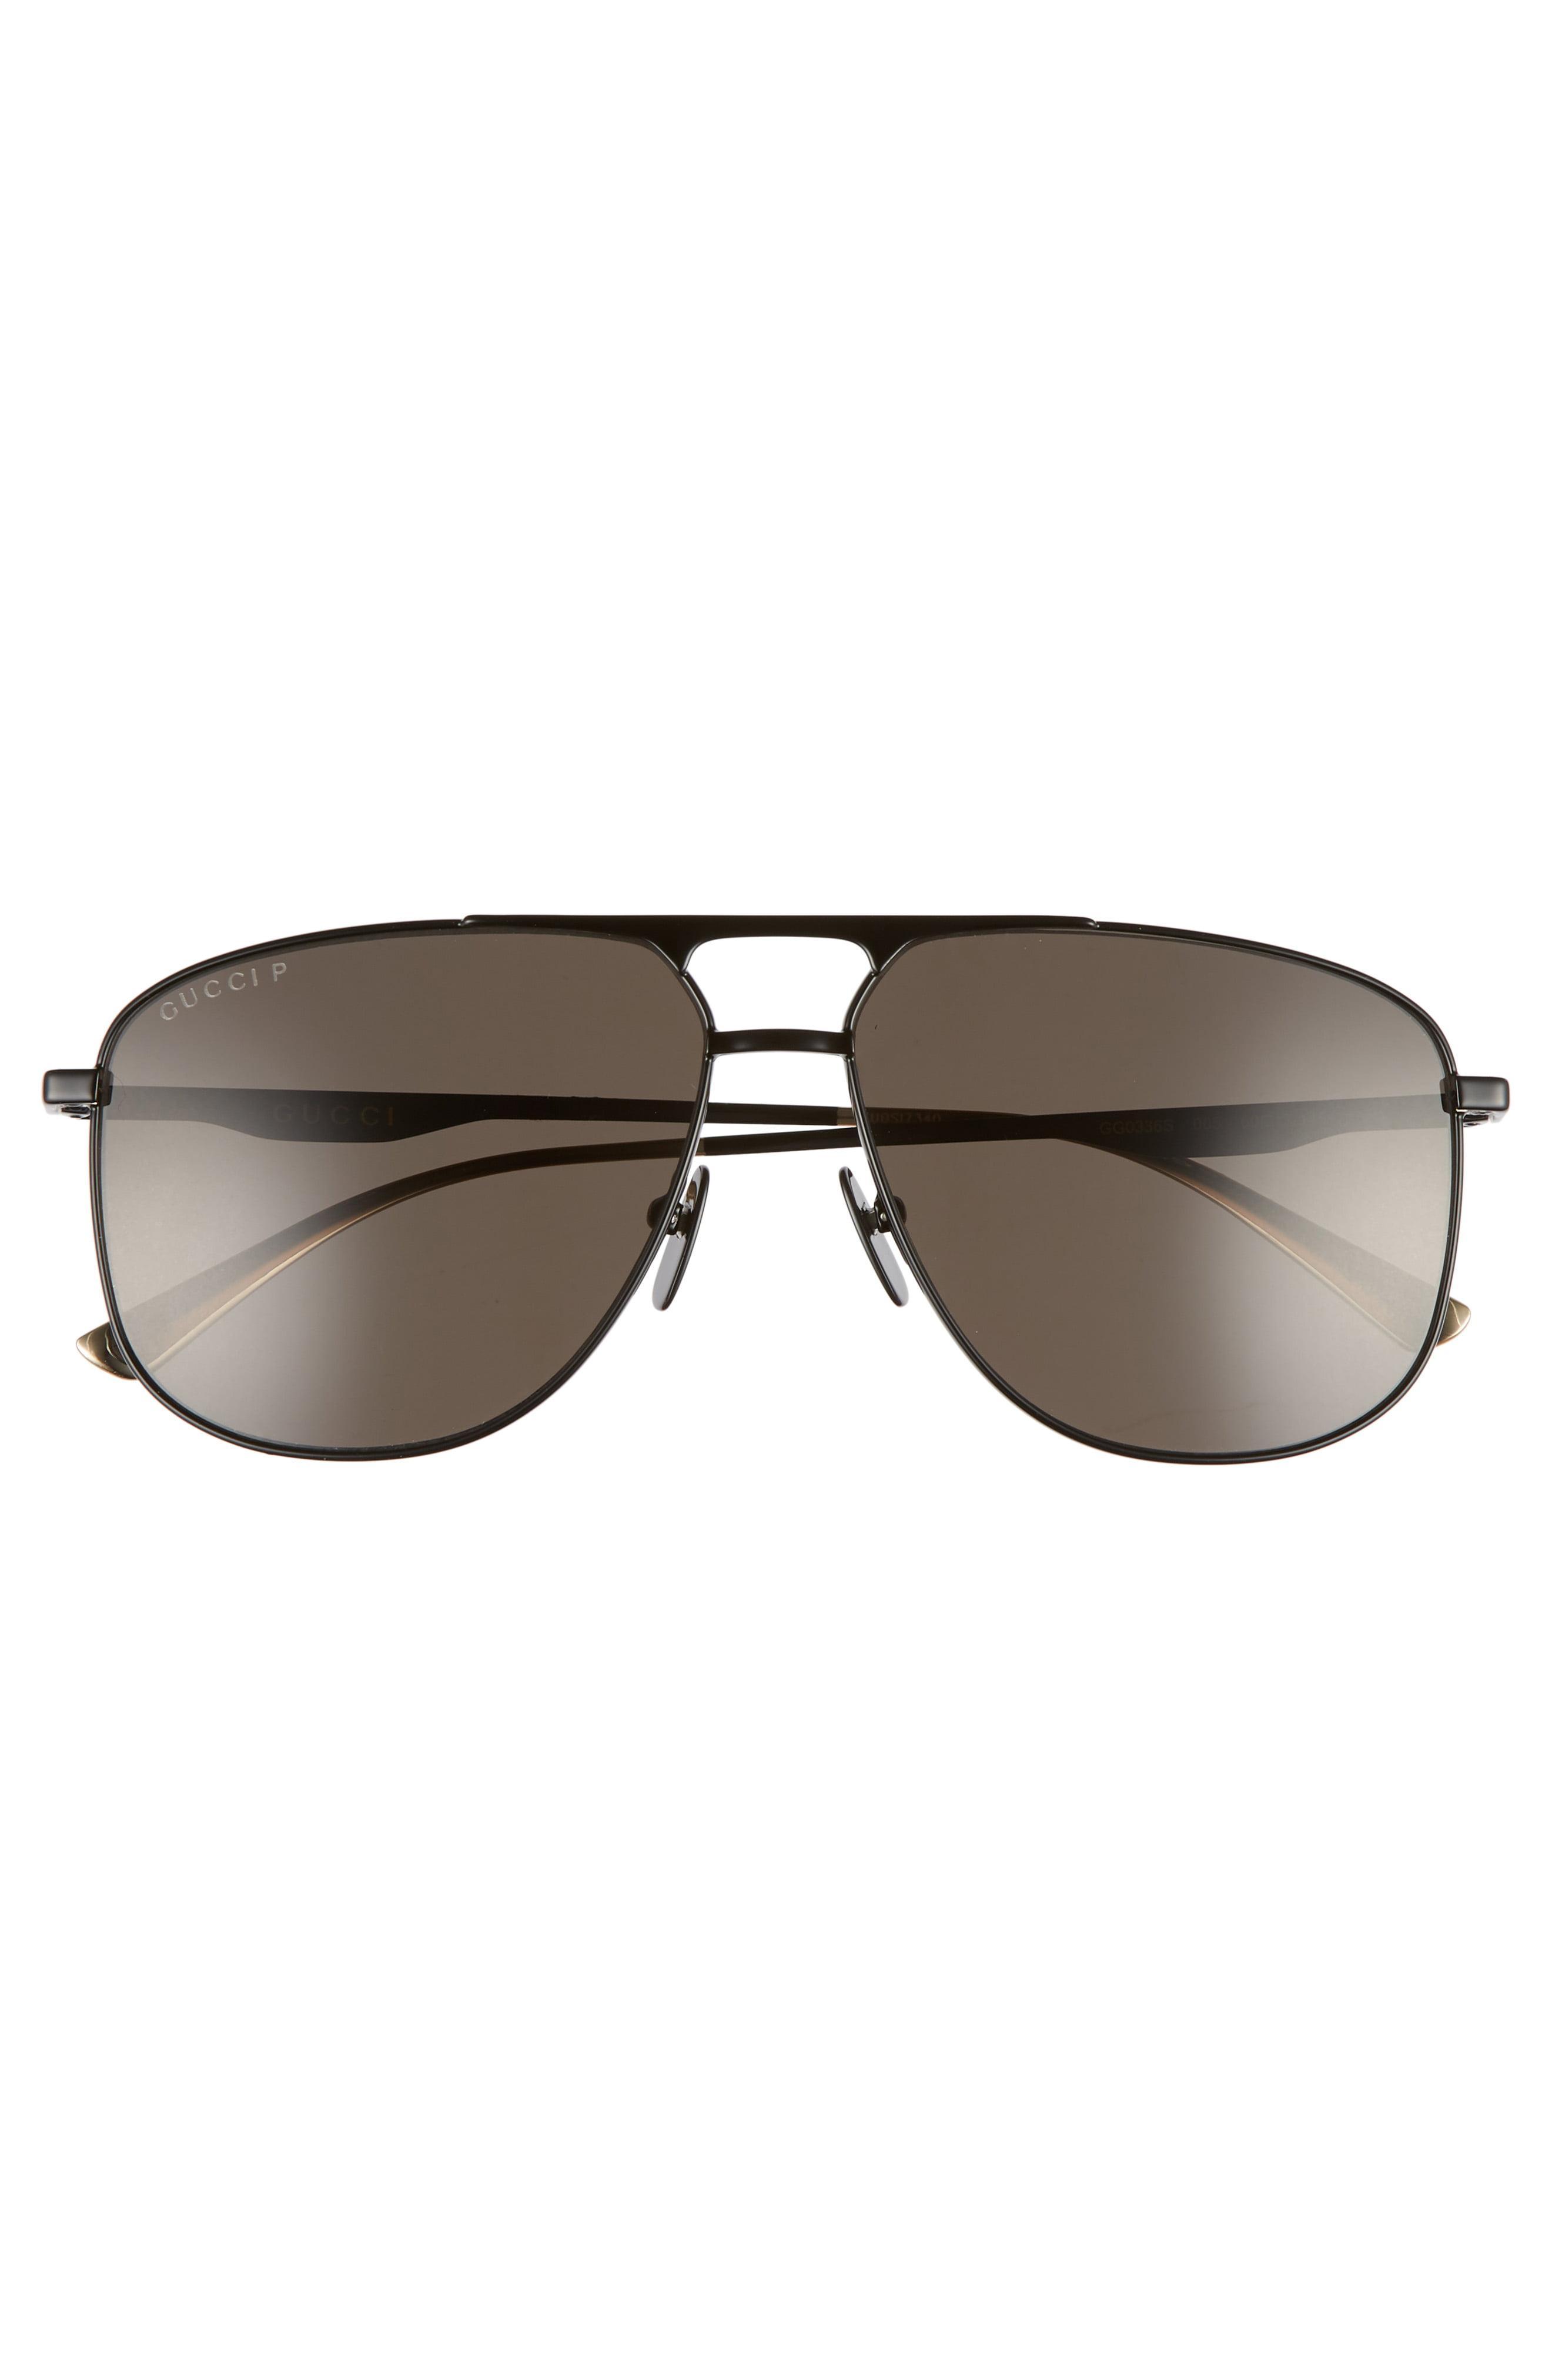 1aff8f0ce86 Gucci - Black 80s Monocolor 60mm Polarized Aviator Sunglasses for Men -  Lyst. View fullscreen